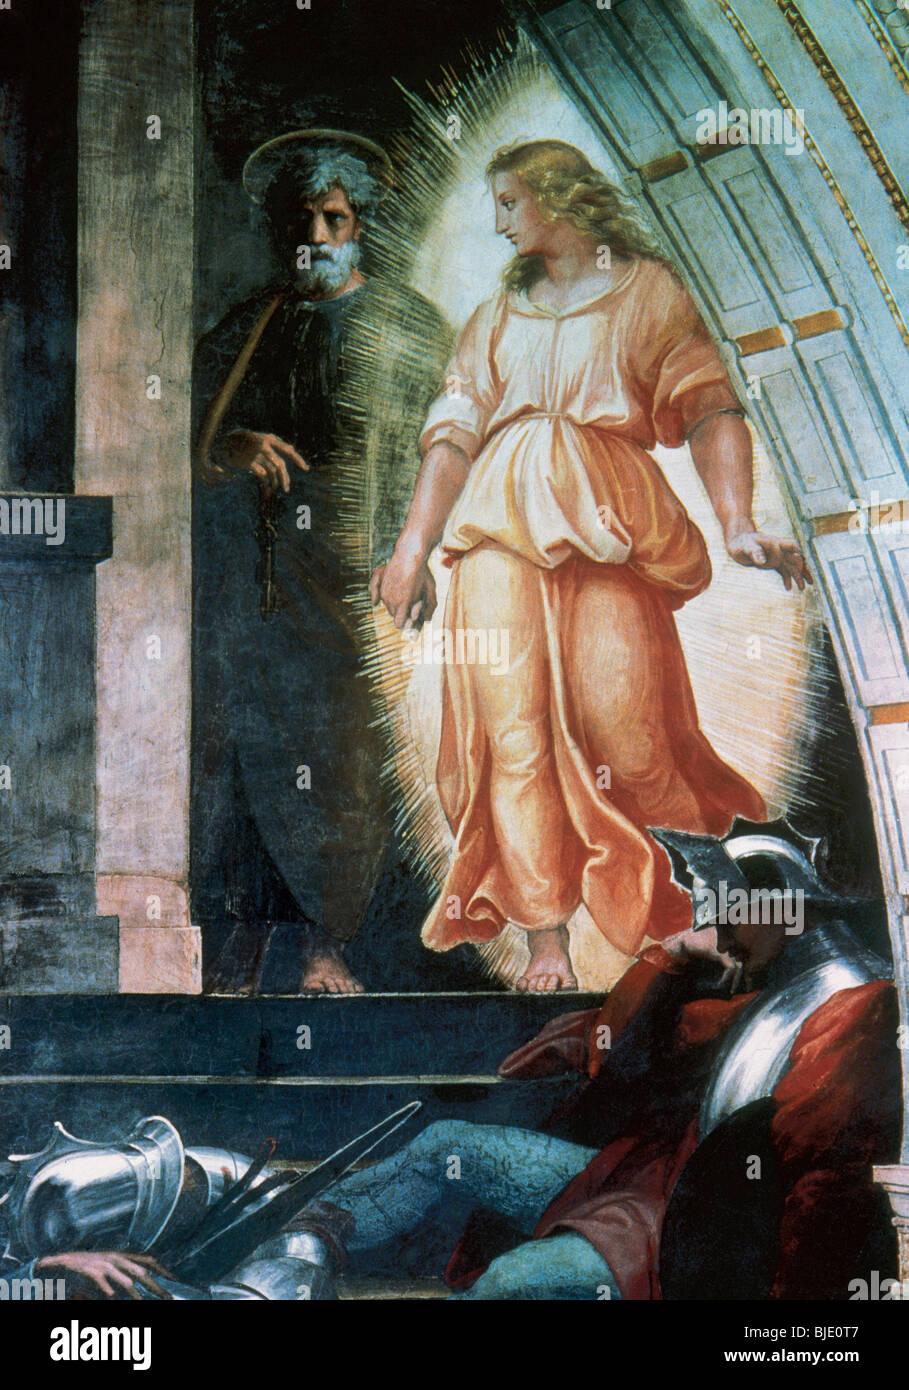 Raphael, Raffaello Santi or Sanzio, called (Urbino, 1483-Rome, 1520). Italian painter. Liberation of St. Peter. - Stock Image